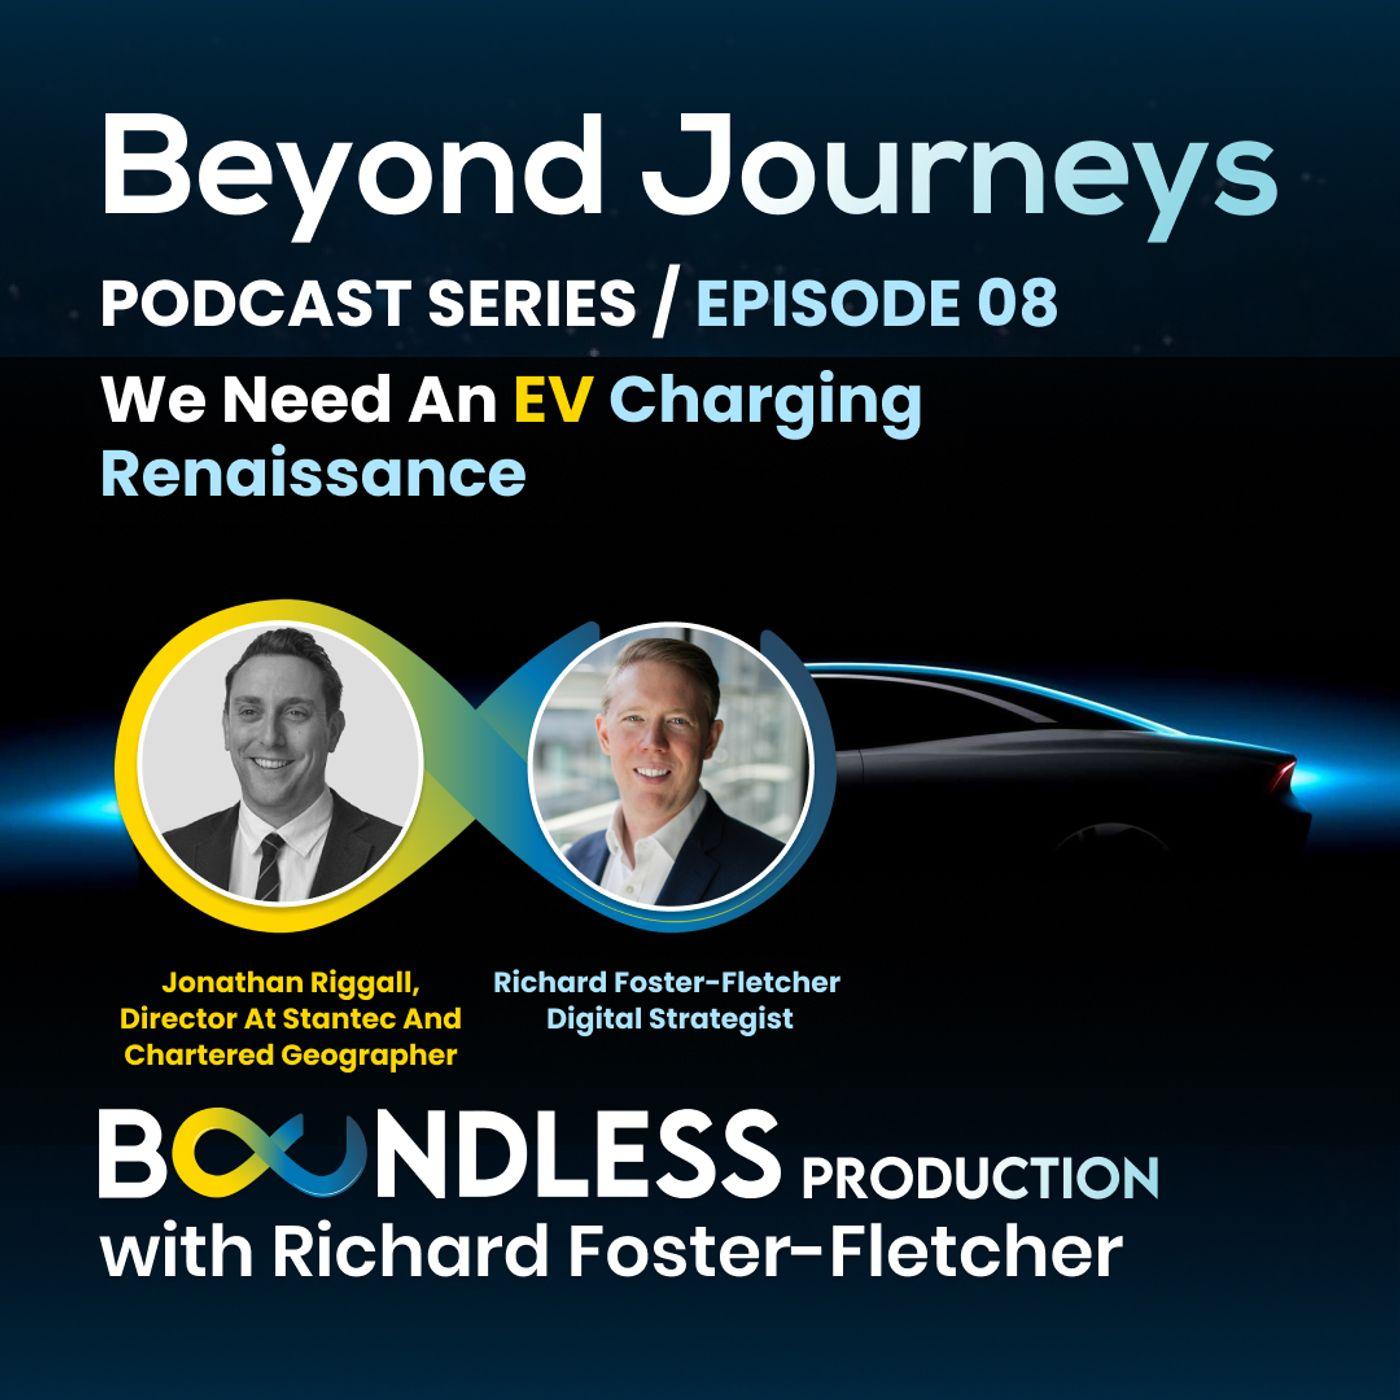 EP8 Beyond Journeys: Jonathan Riggall, Director at Stantec: We need an EV Charging Renaissance